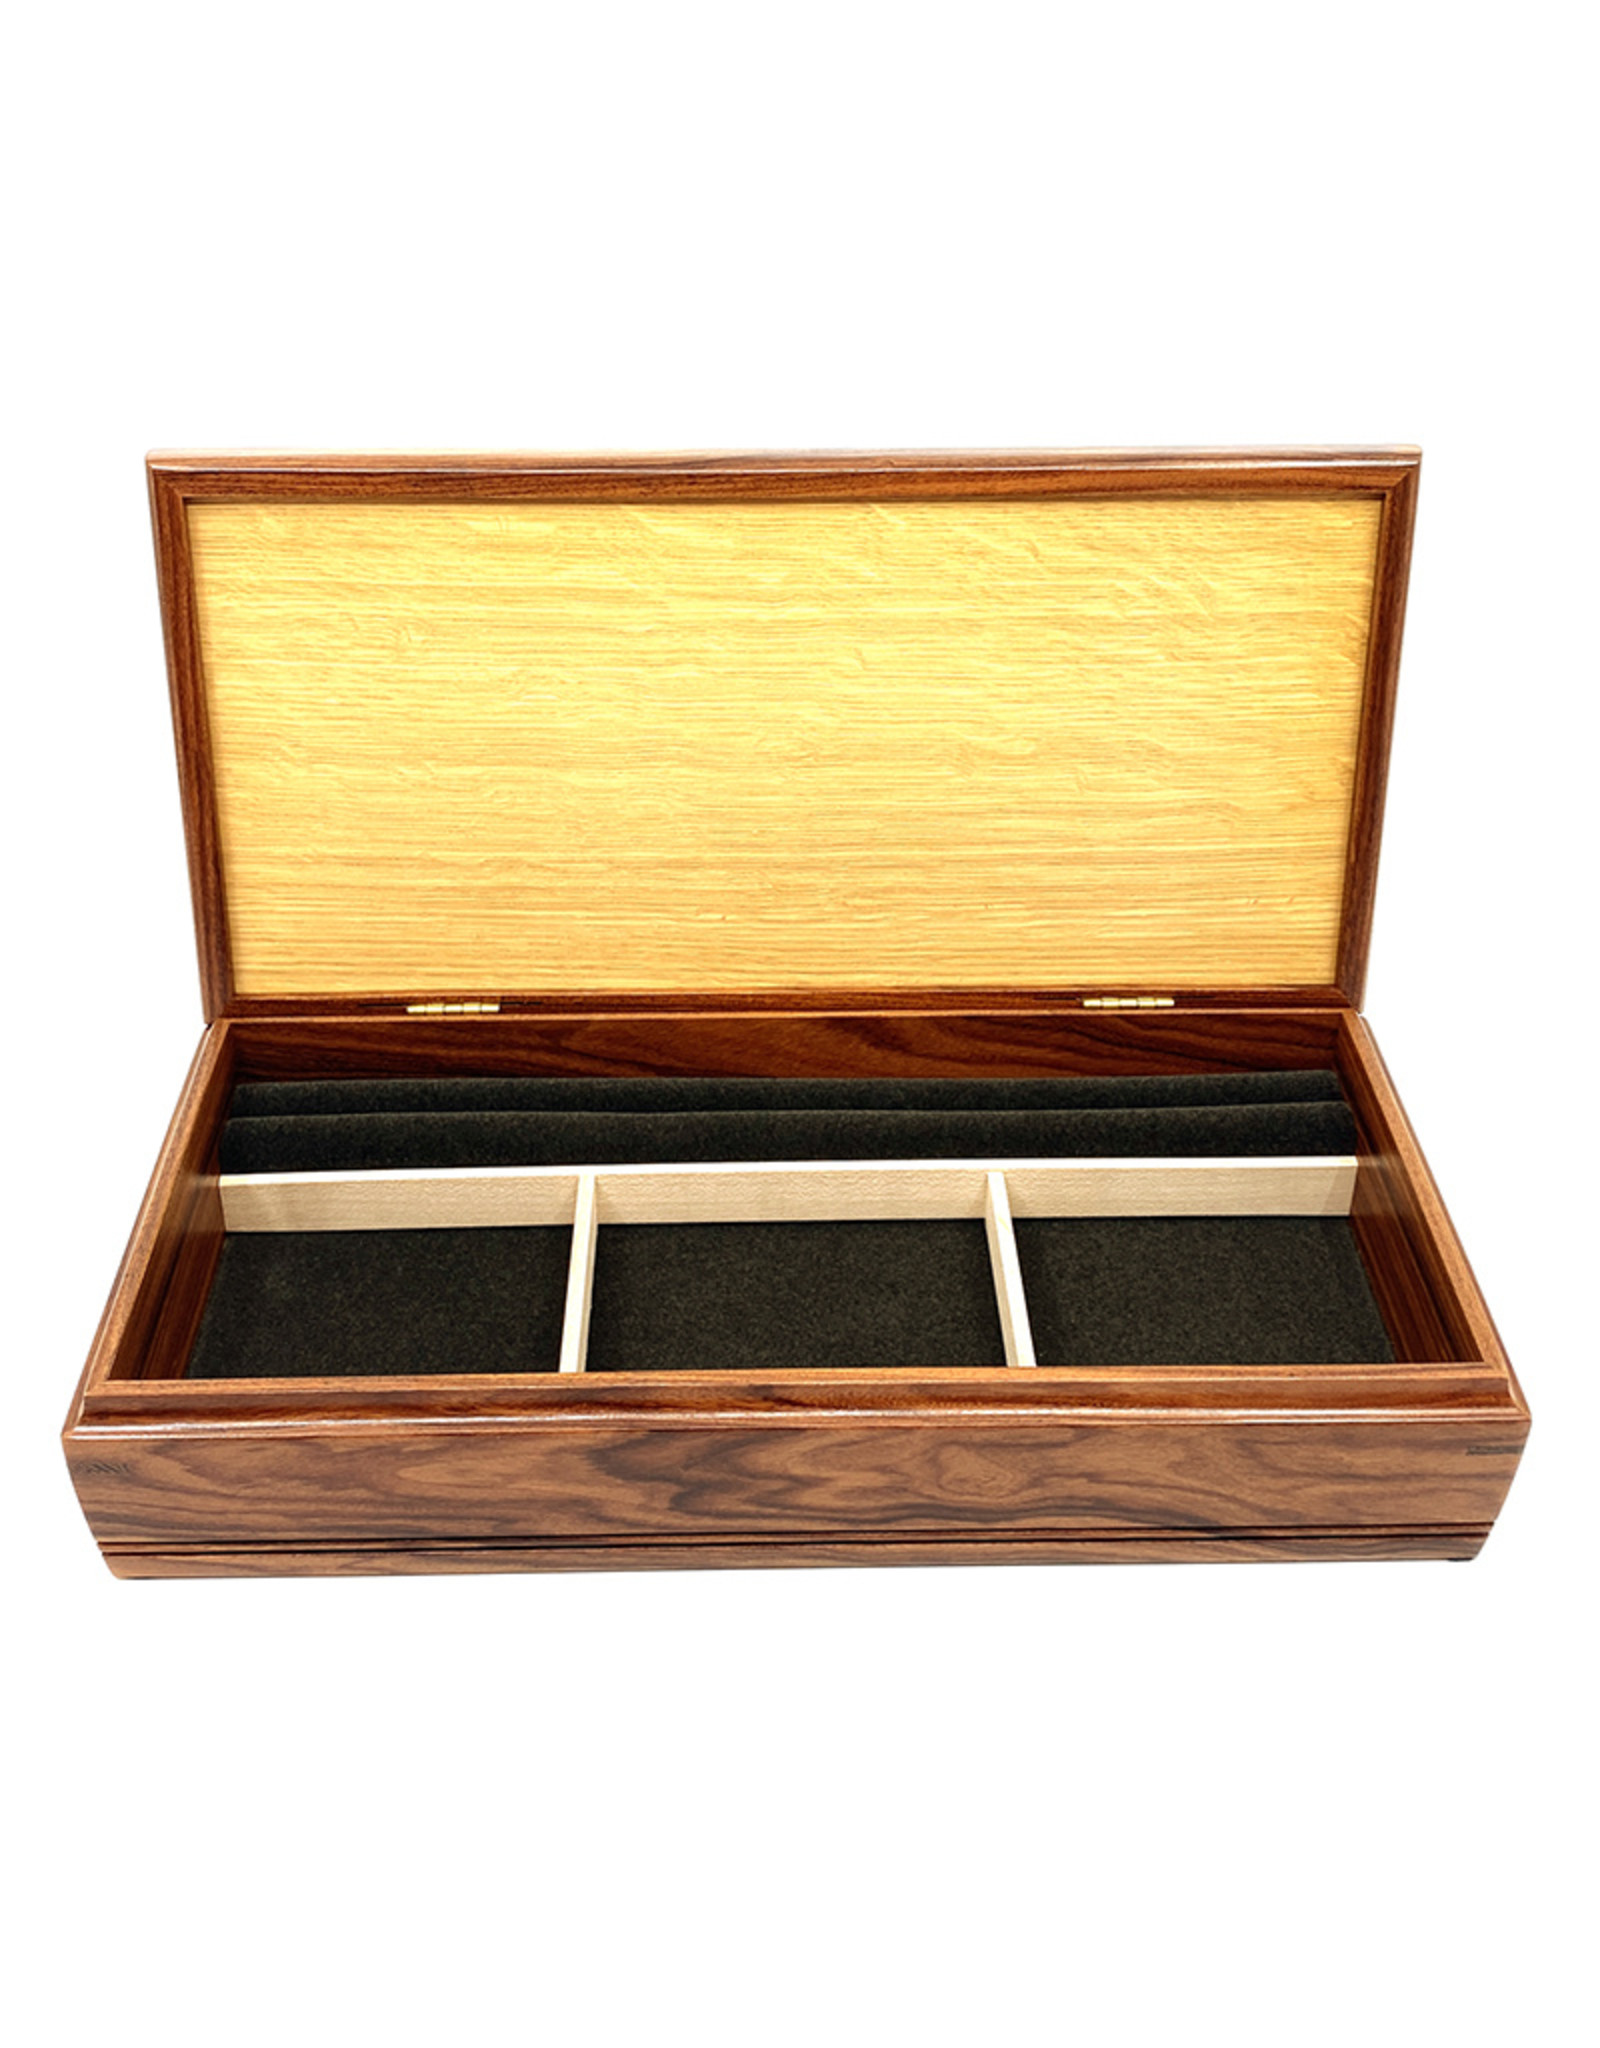 MIKUTOWSKI WOODWORKING MAPLE & ROSEWOOD SENTINEL BOX